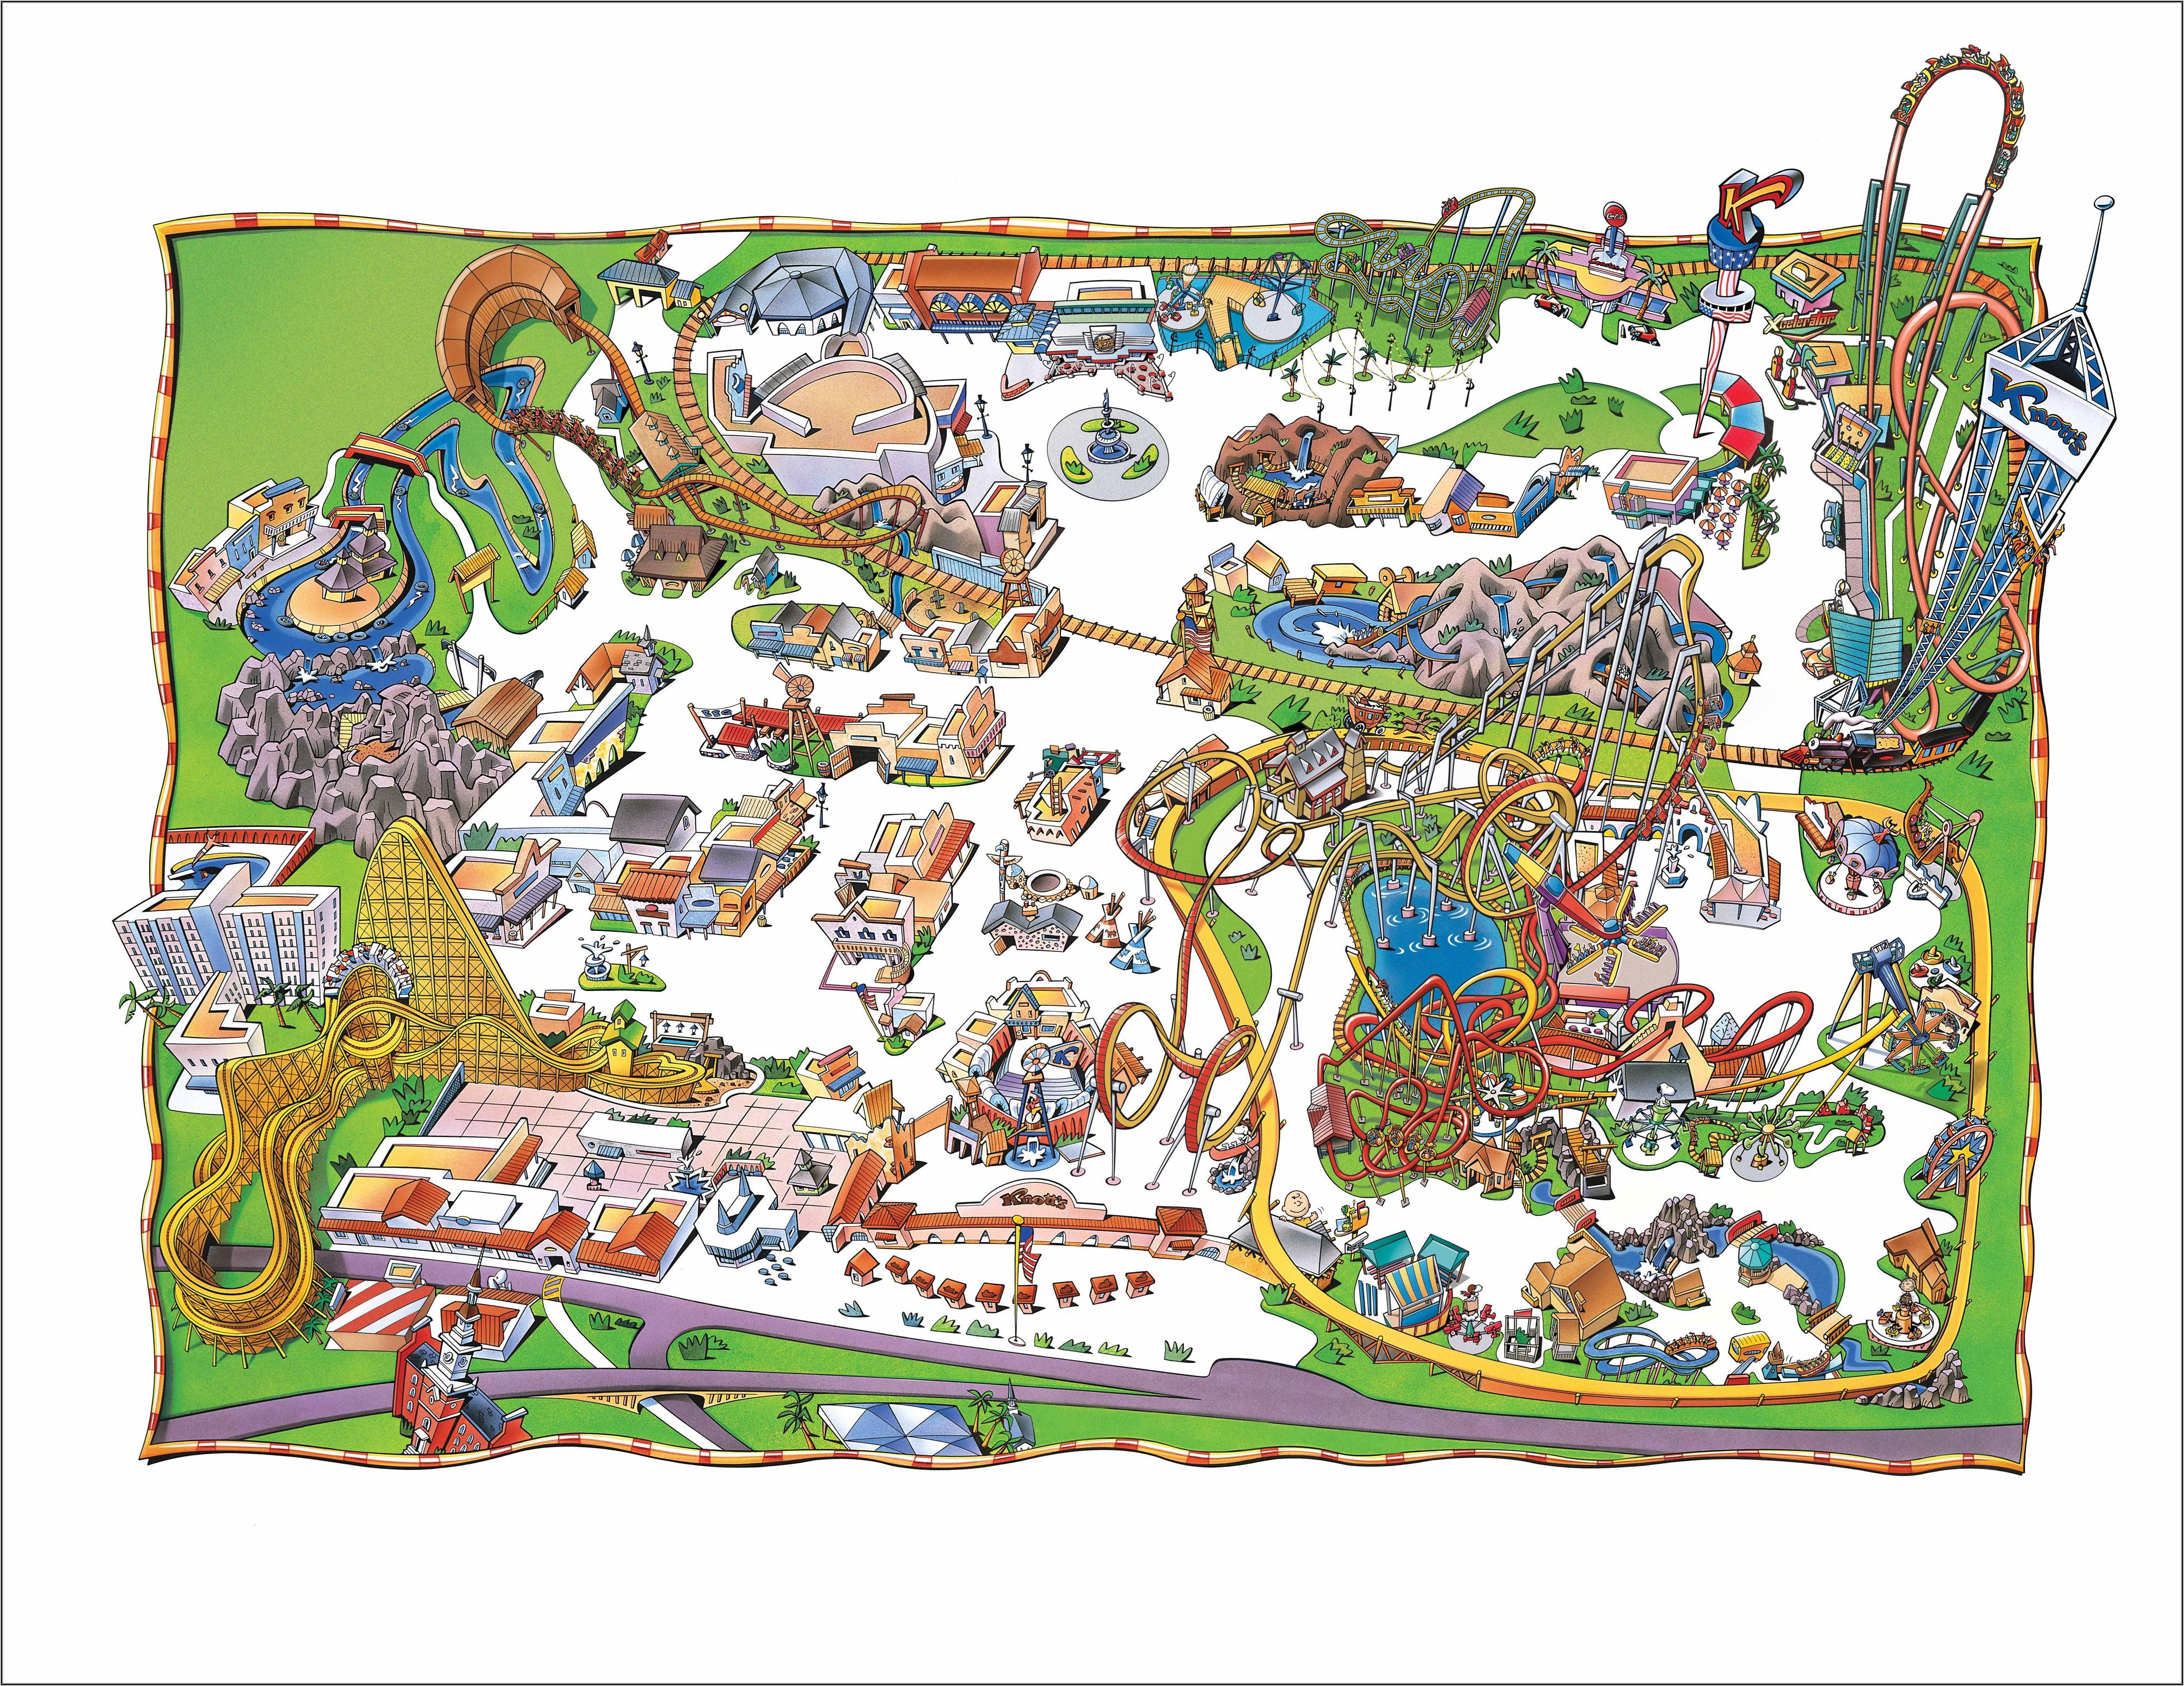 Knott's Berry Farm Map 1999